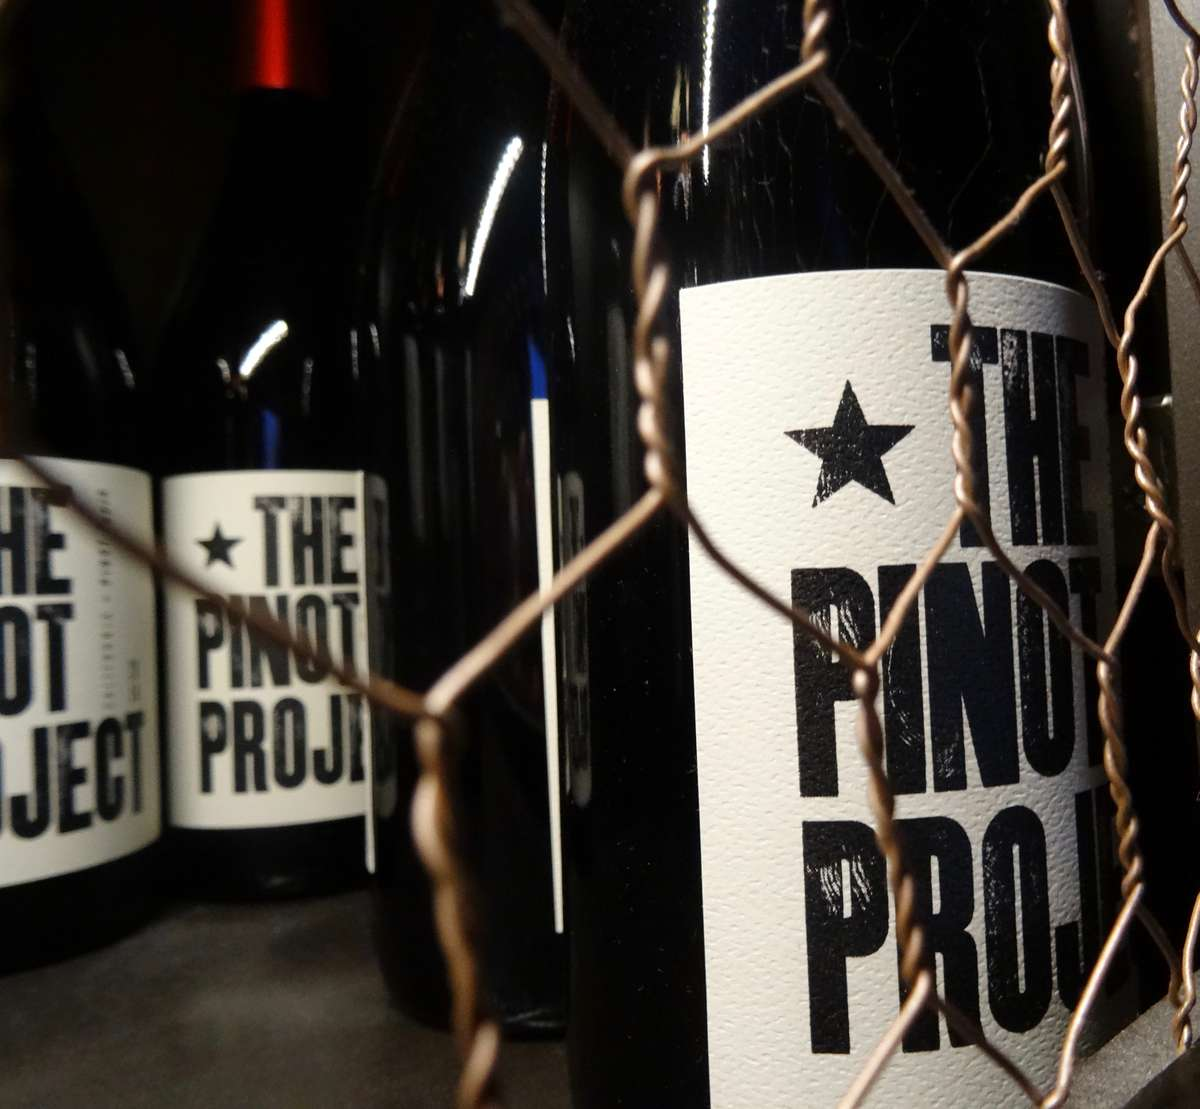 Pinot Project (California) // Pinot Noir